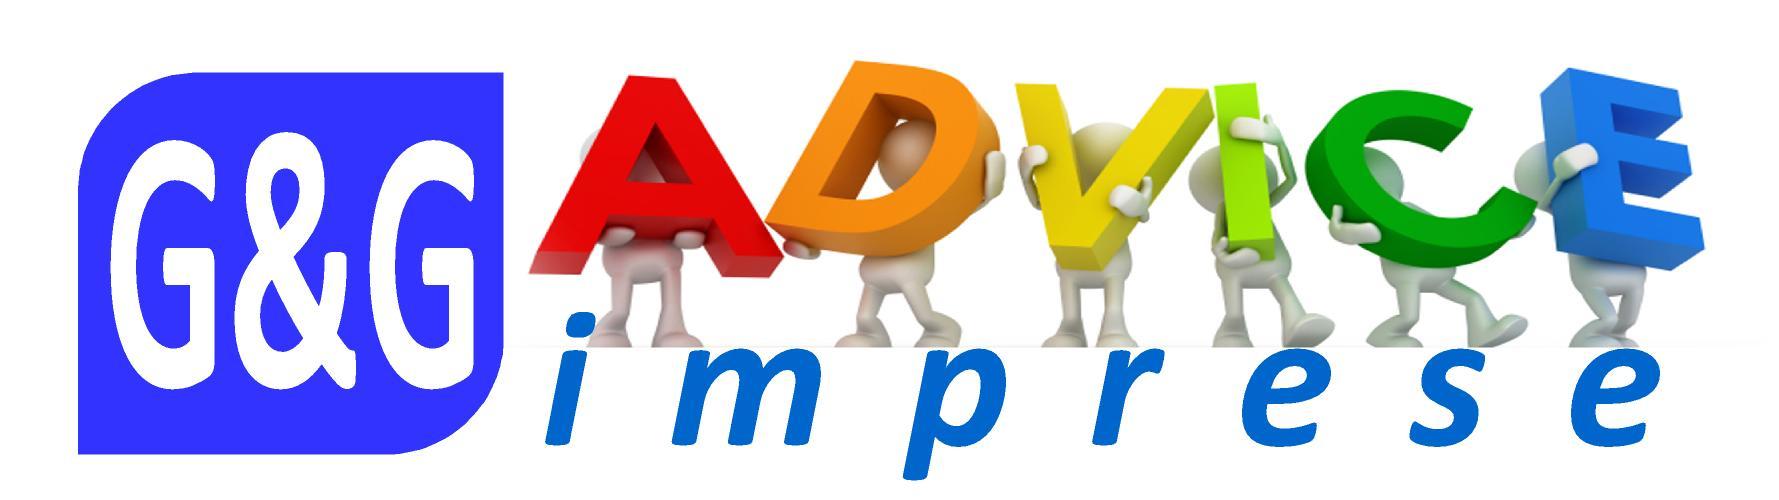 Gg Advice Imprese